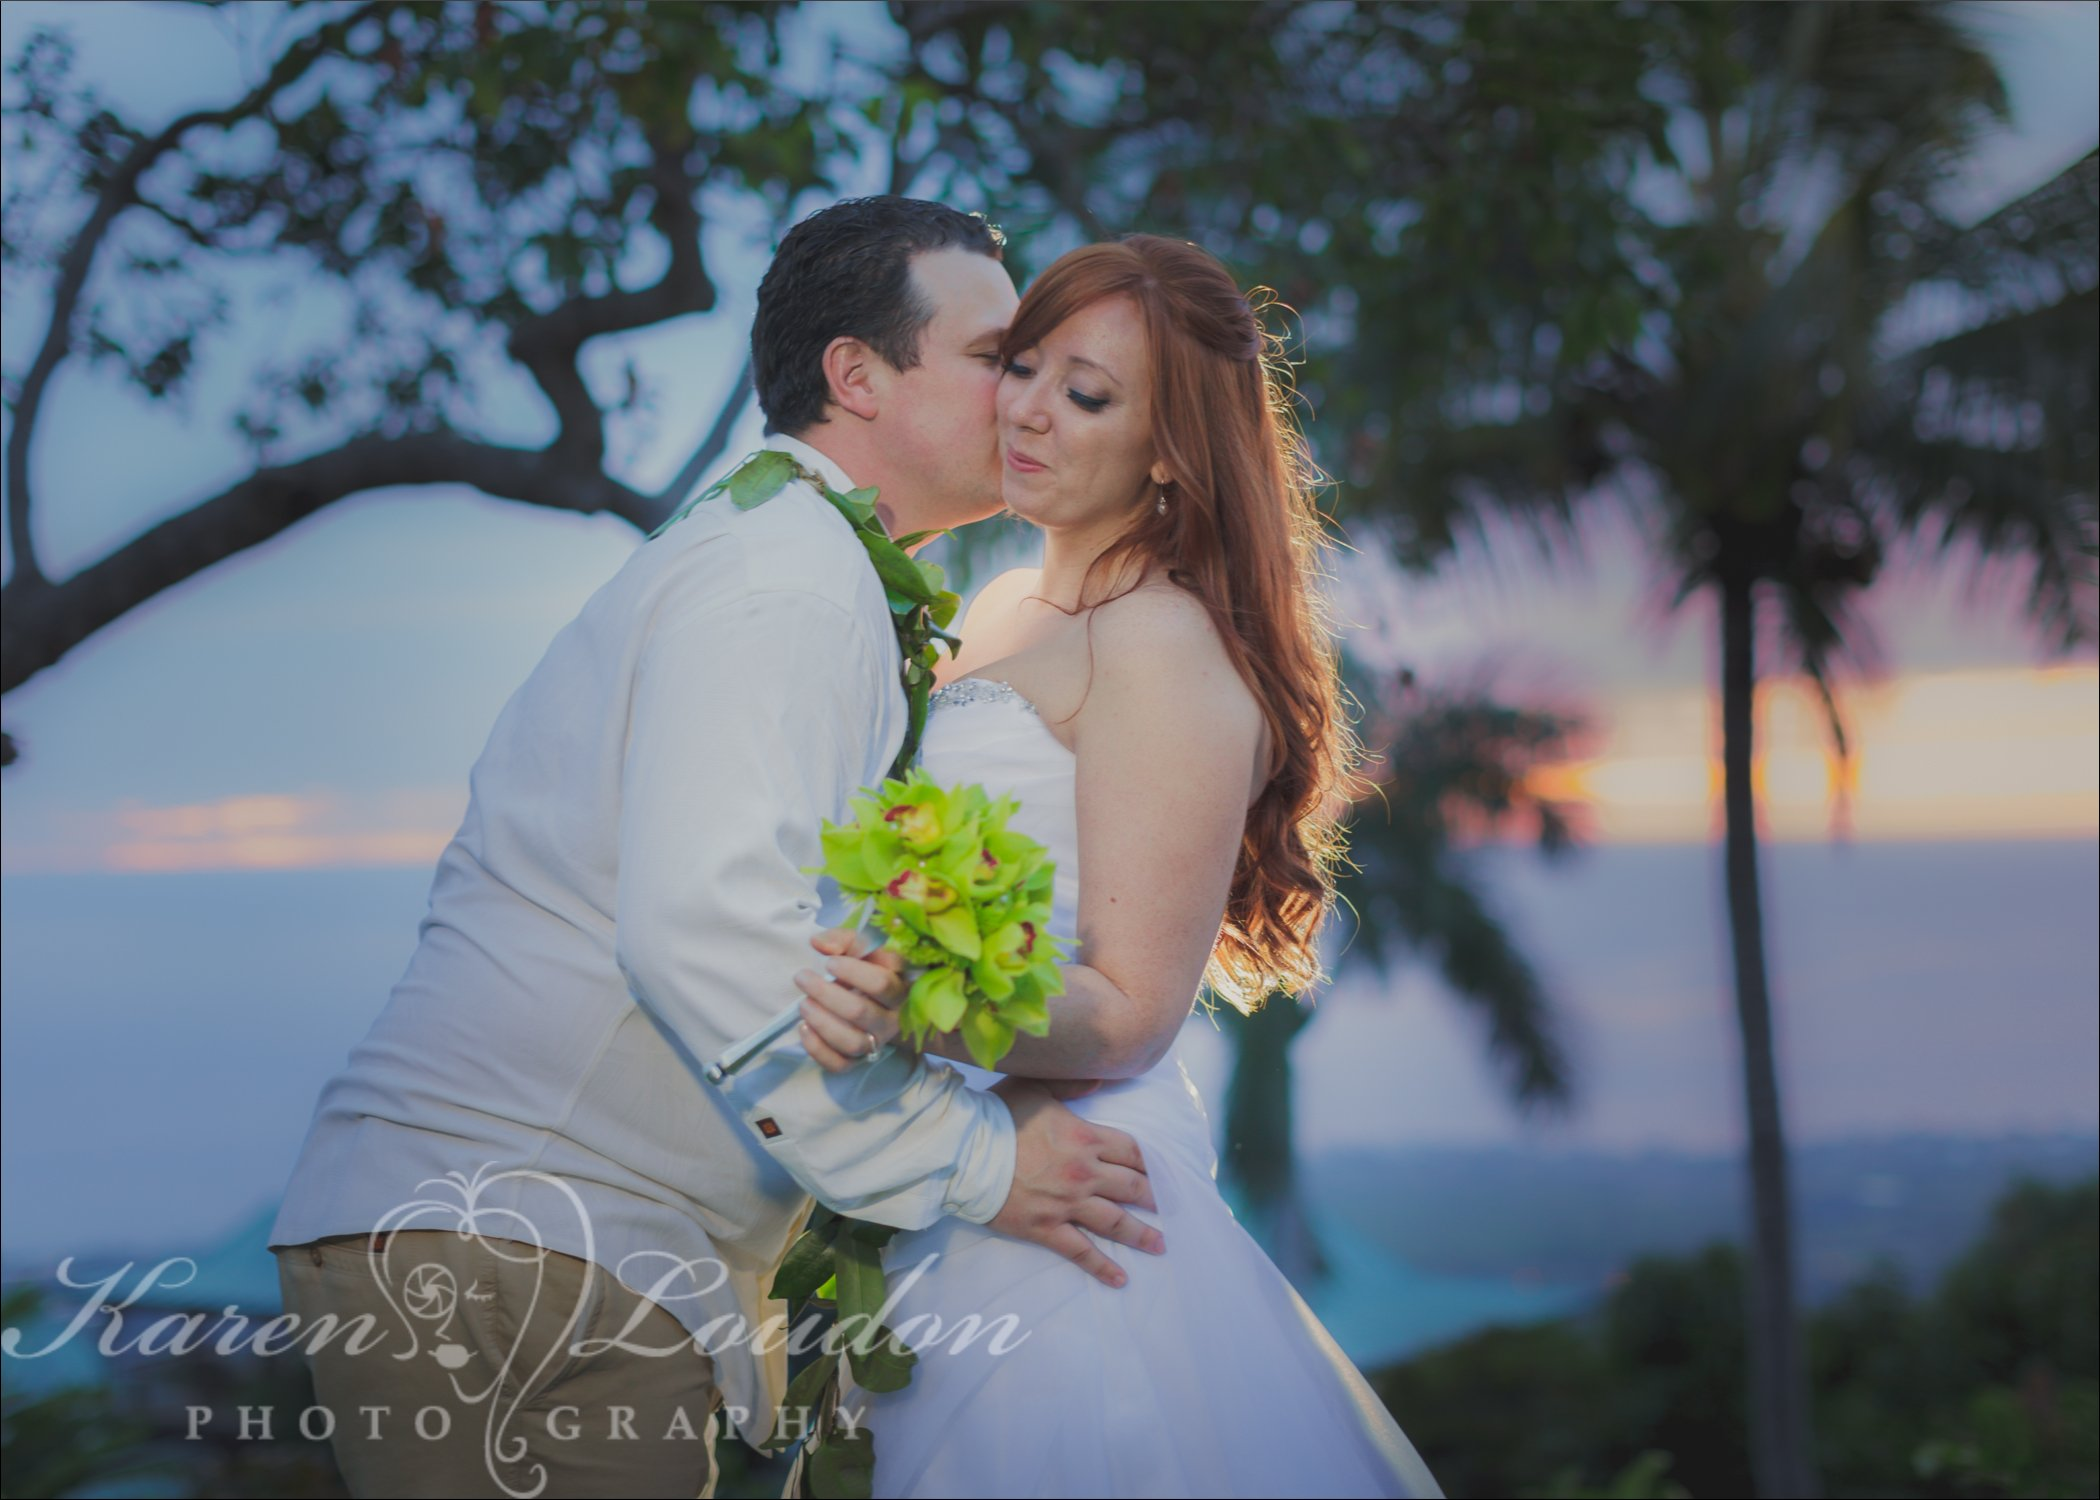 Holualoa sunset © Karen Loudon Photography